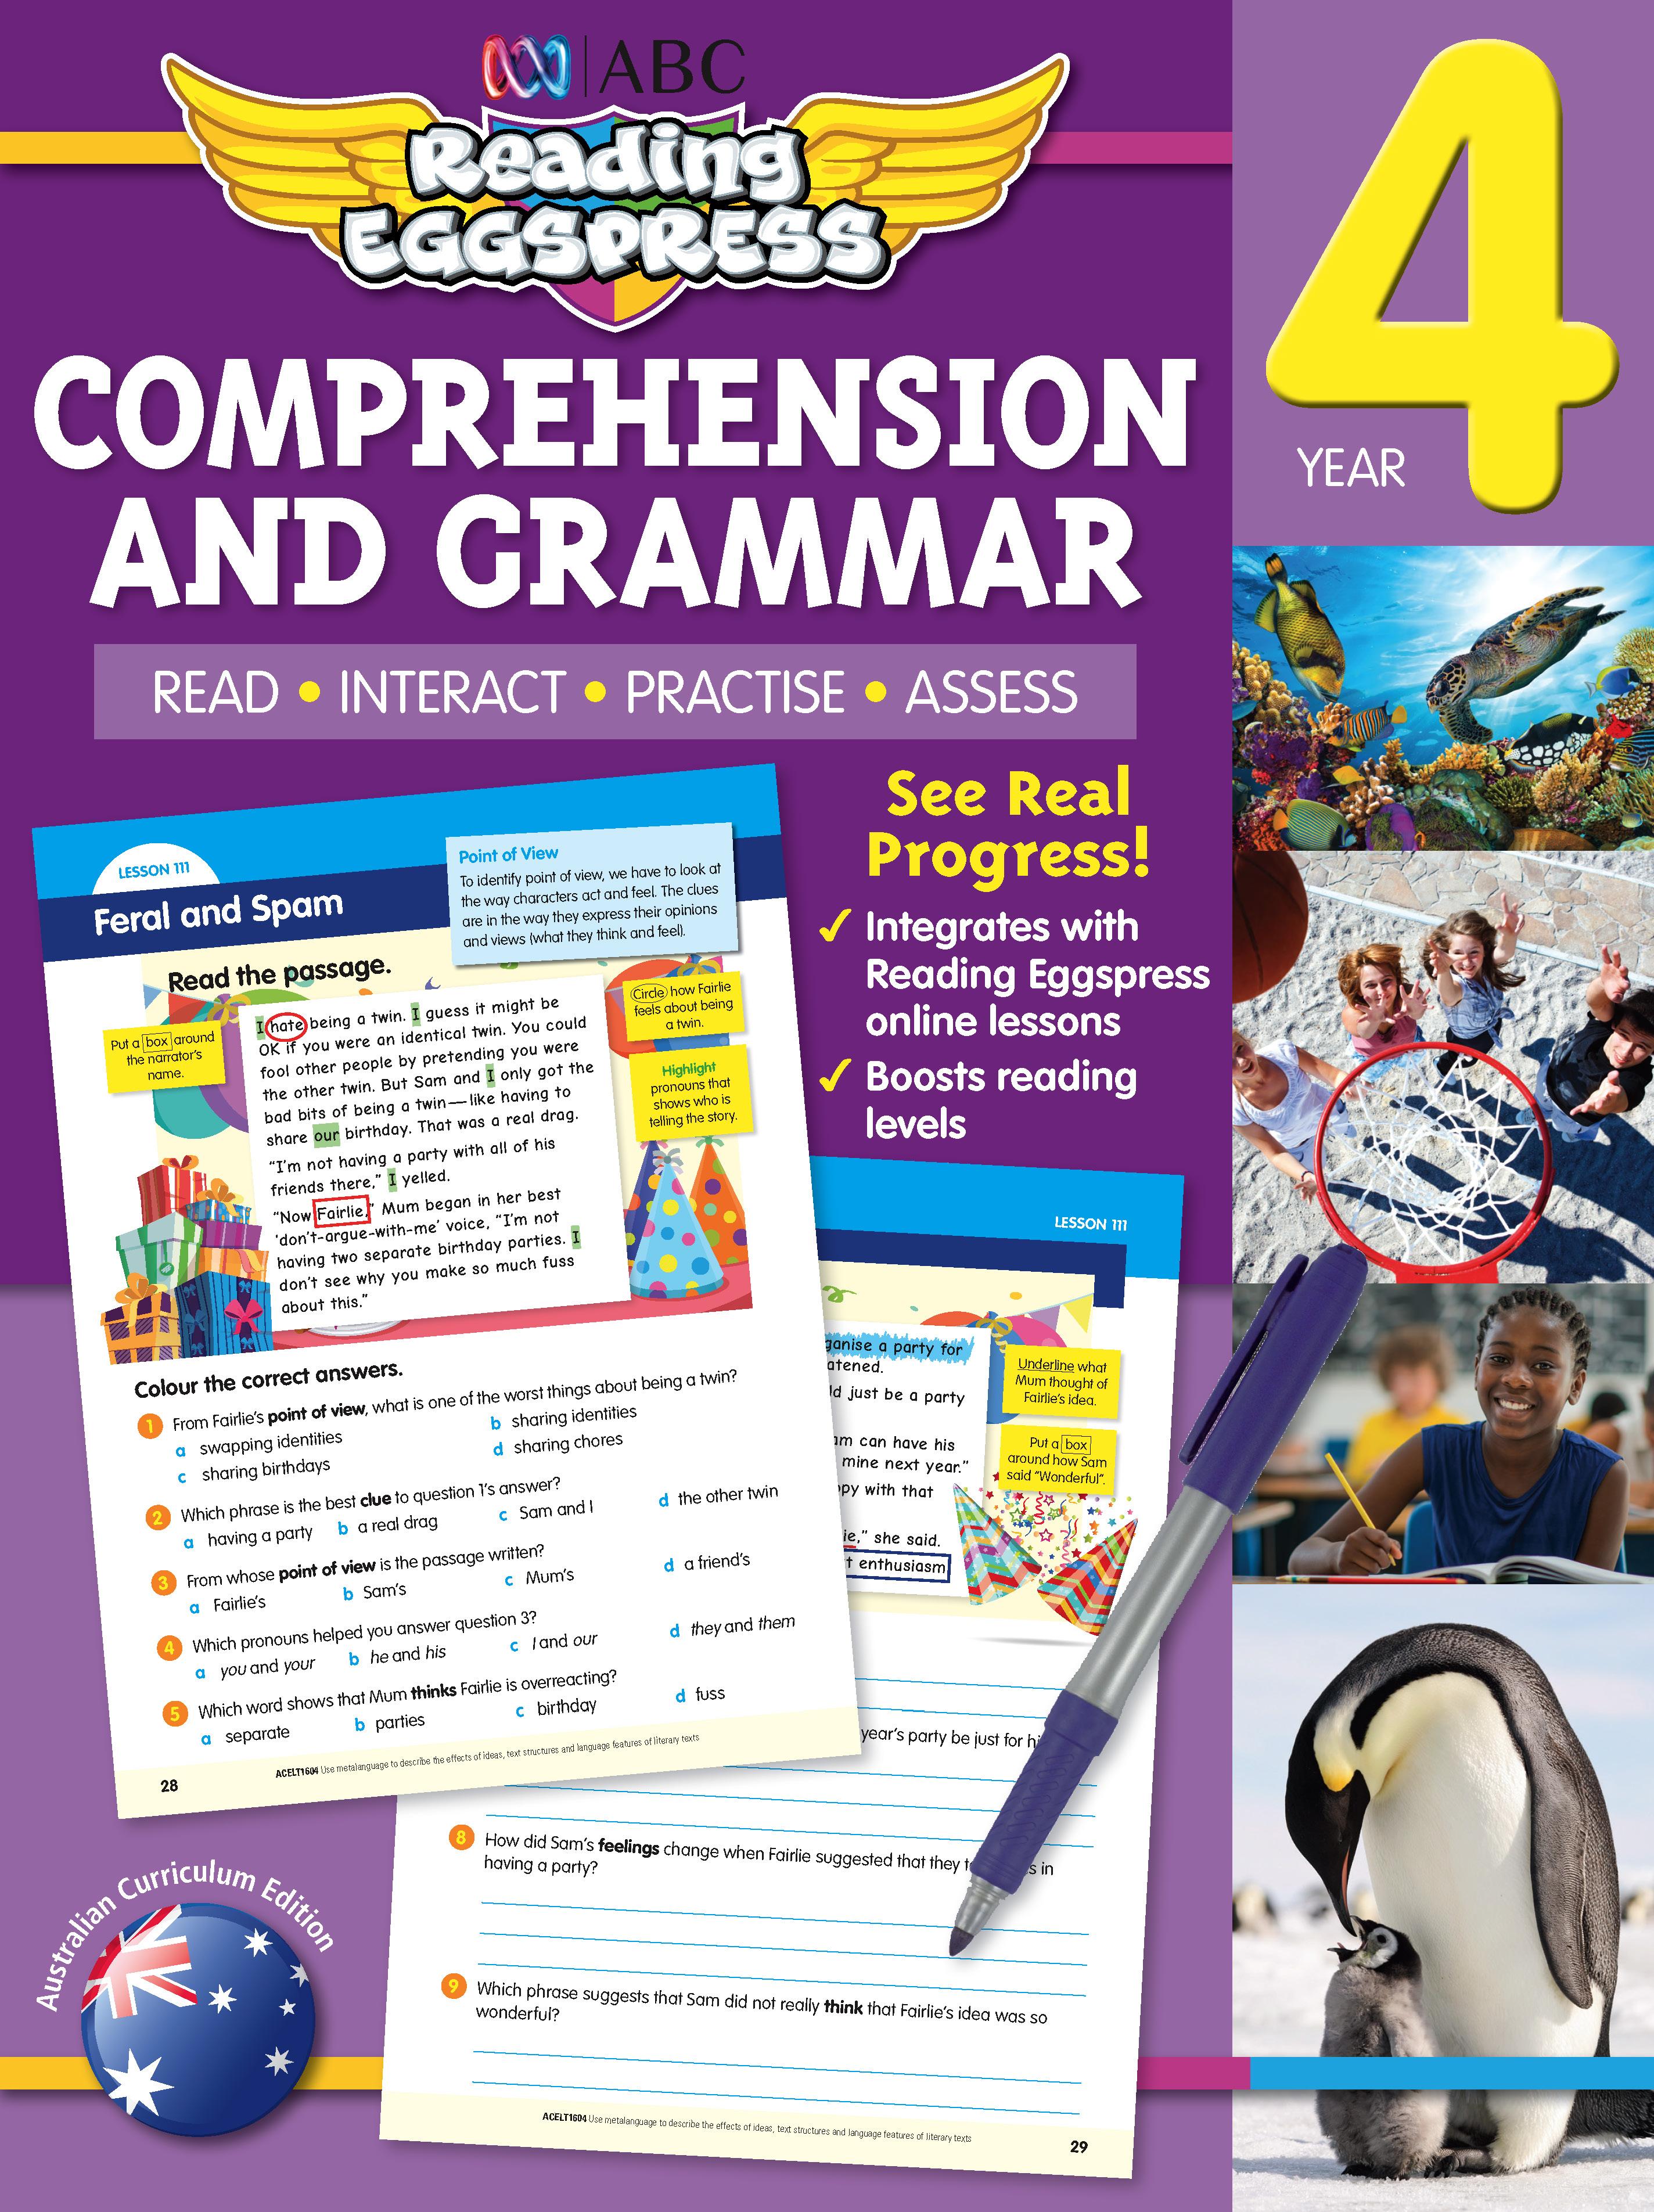 ABC Reading Eggspress Comprehension and Grammar Workbook Year 4